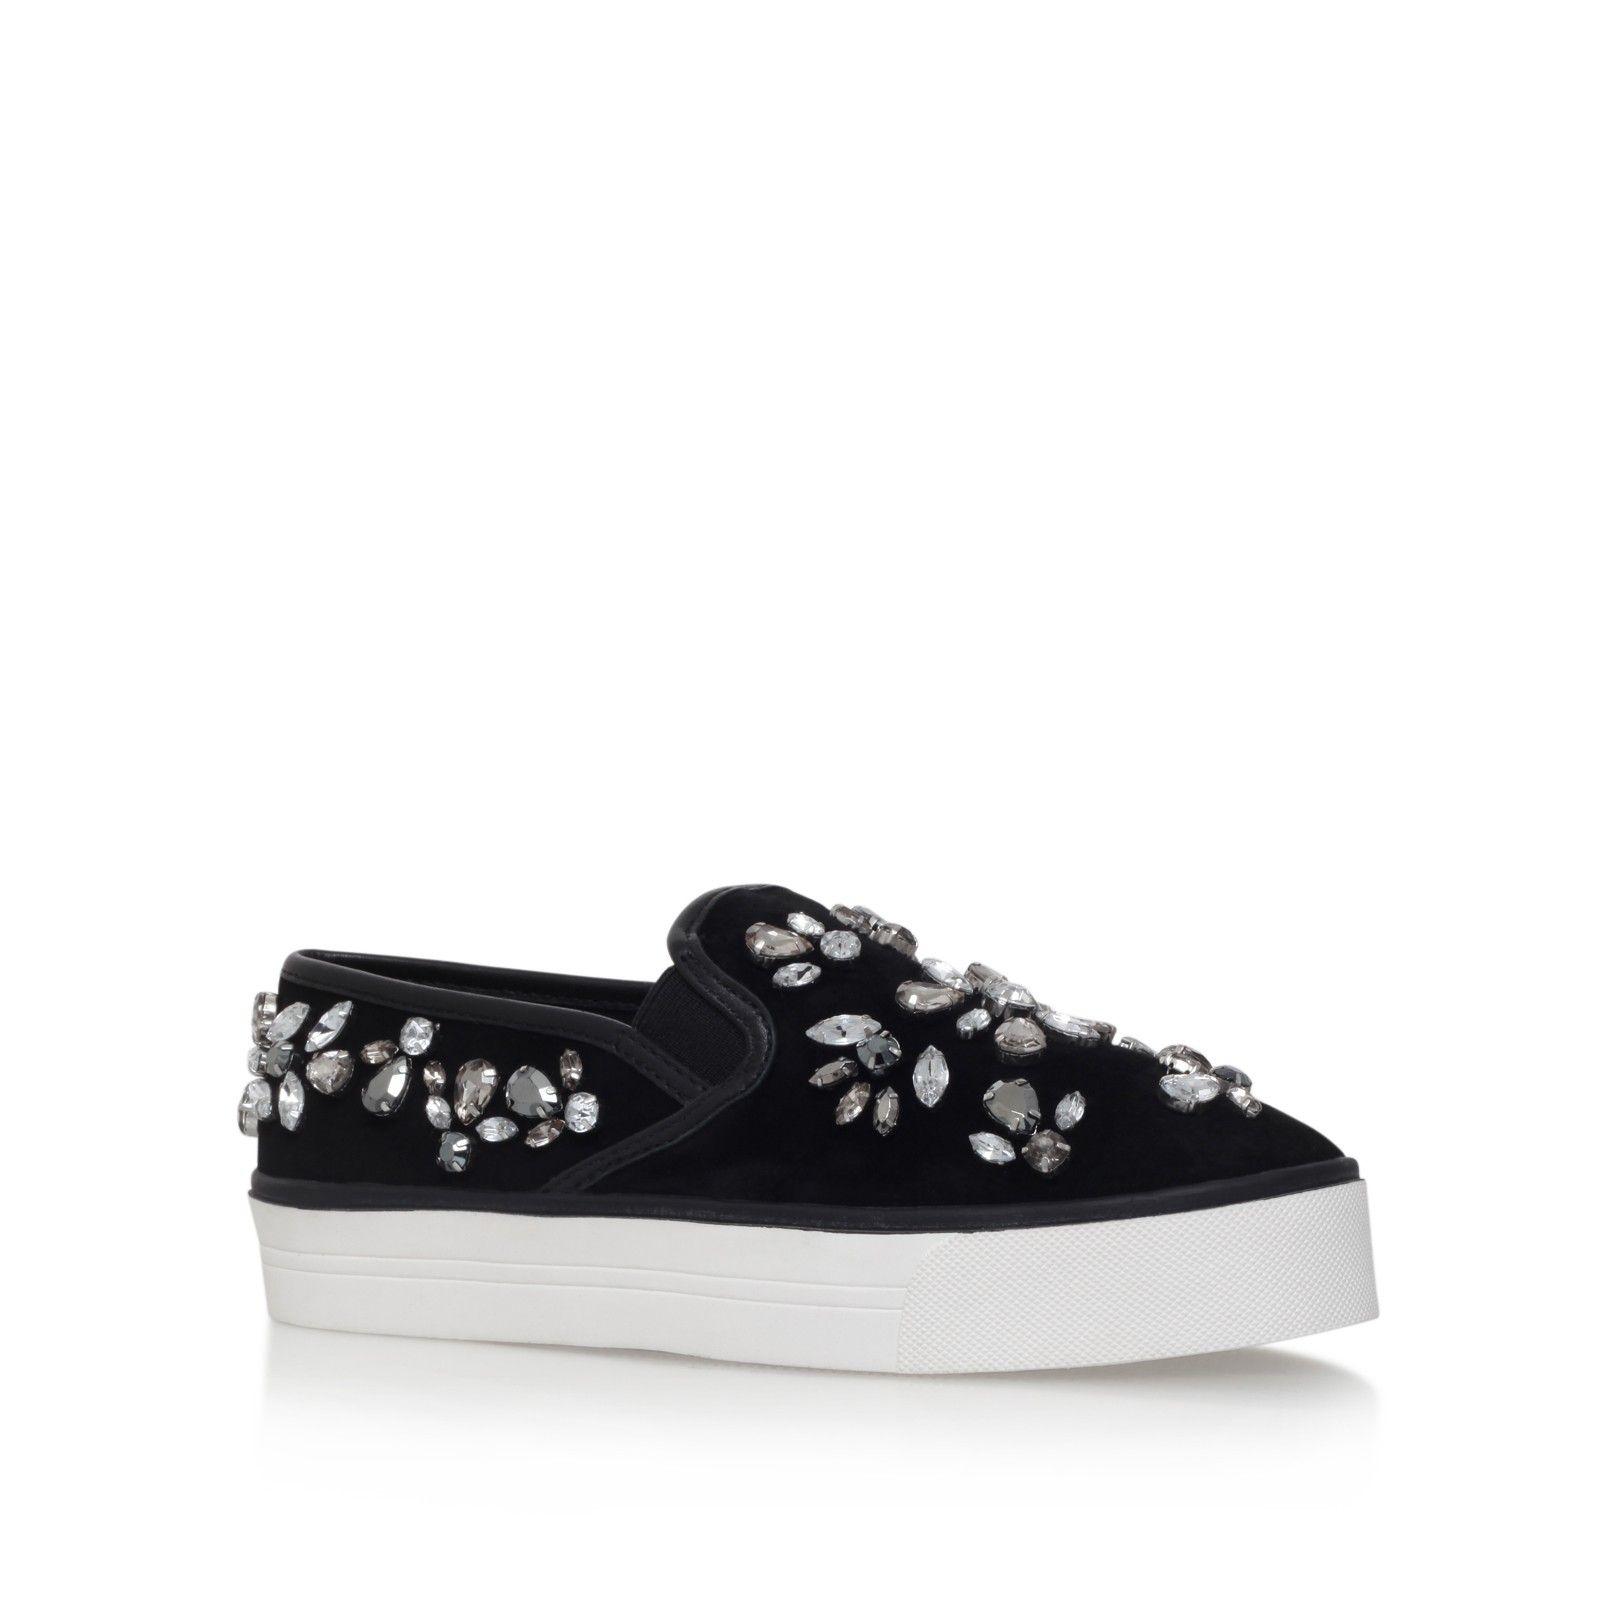 FOOTWEAR - Low-tops & sneakers Carvela wCkwZ